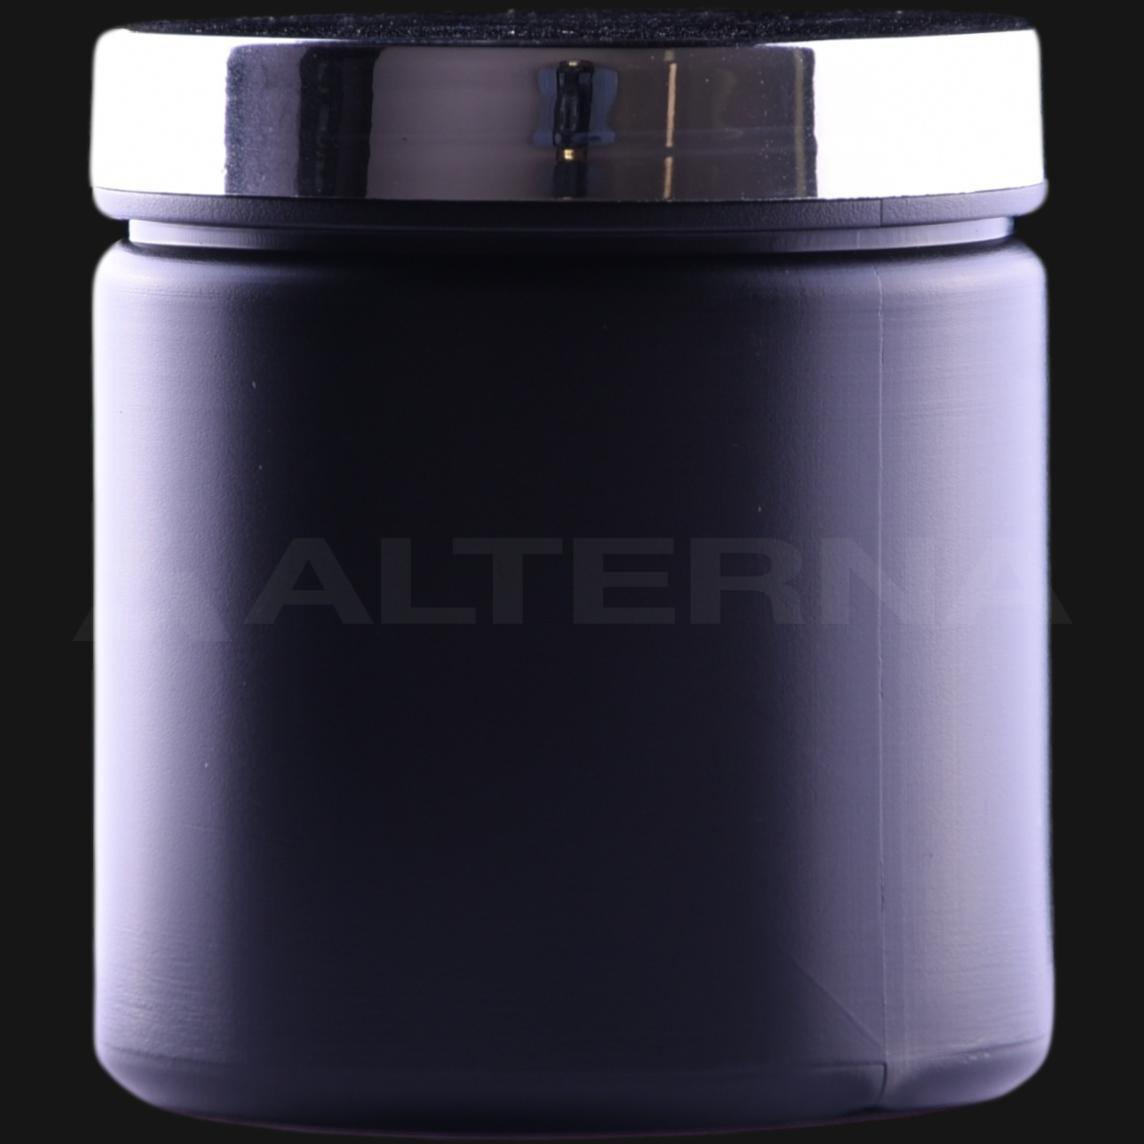 250 ml HDPE Jar with Silver Cap